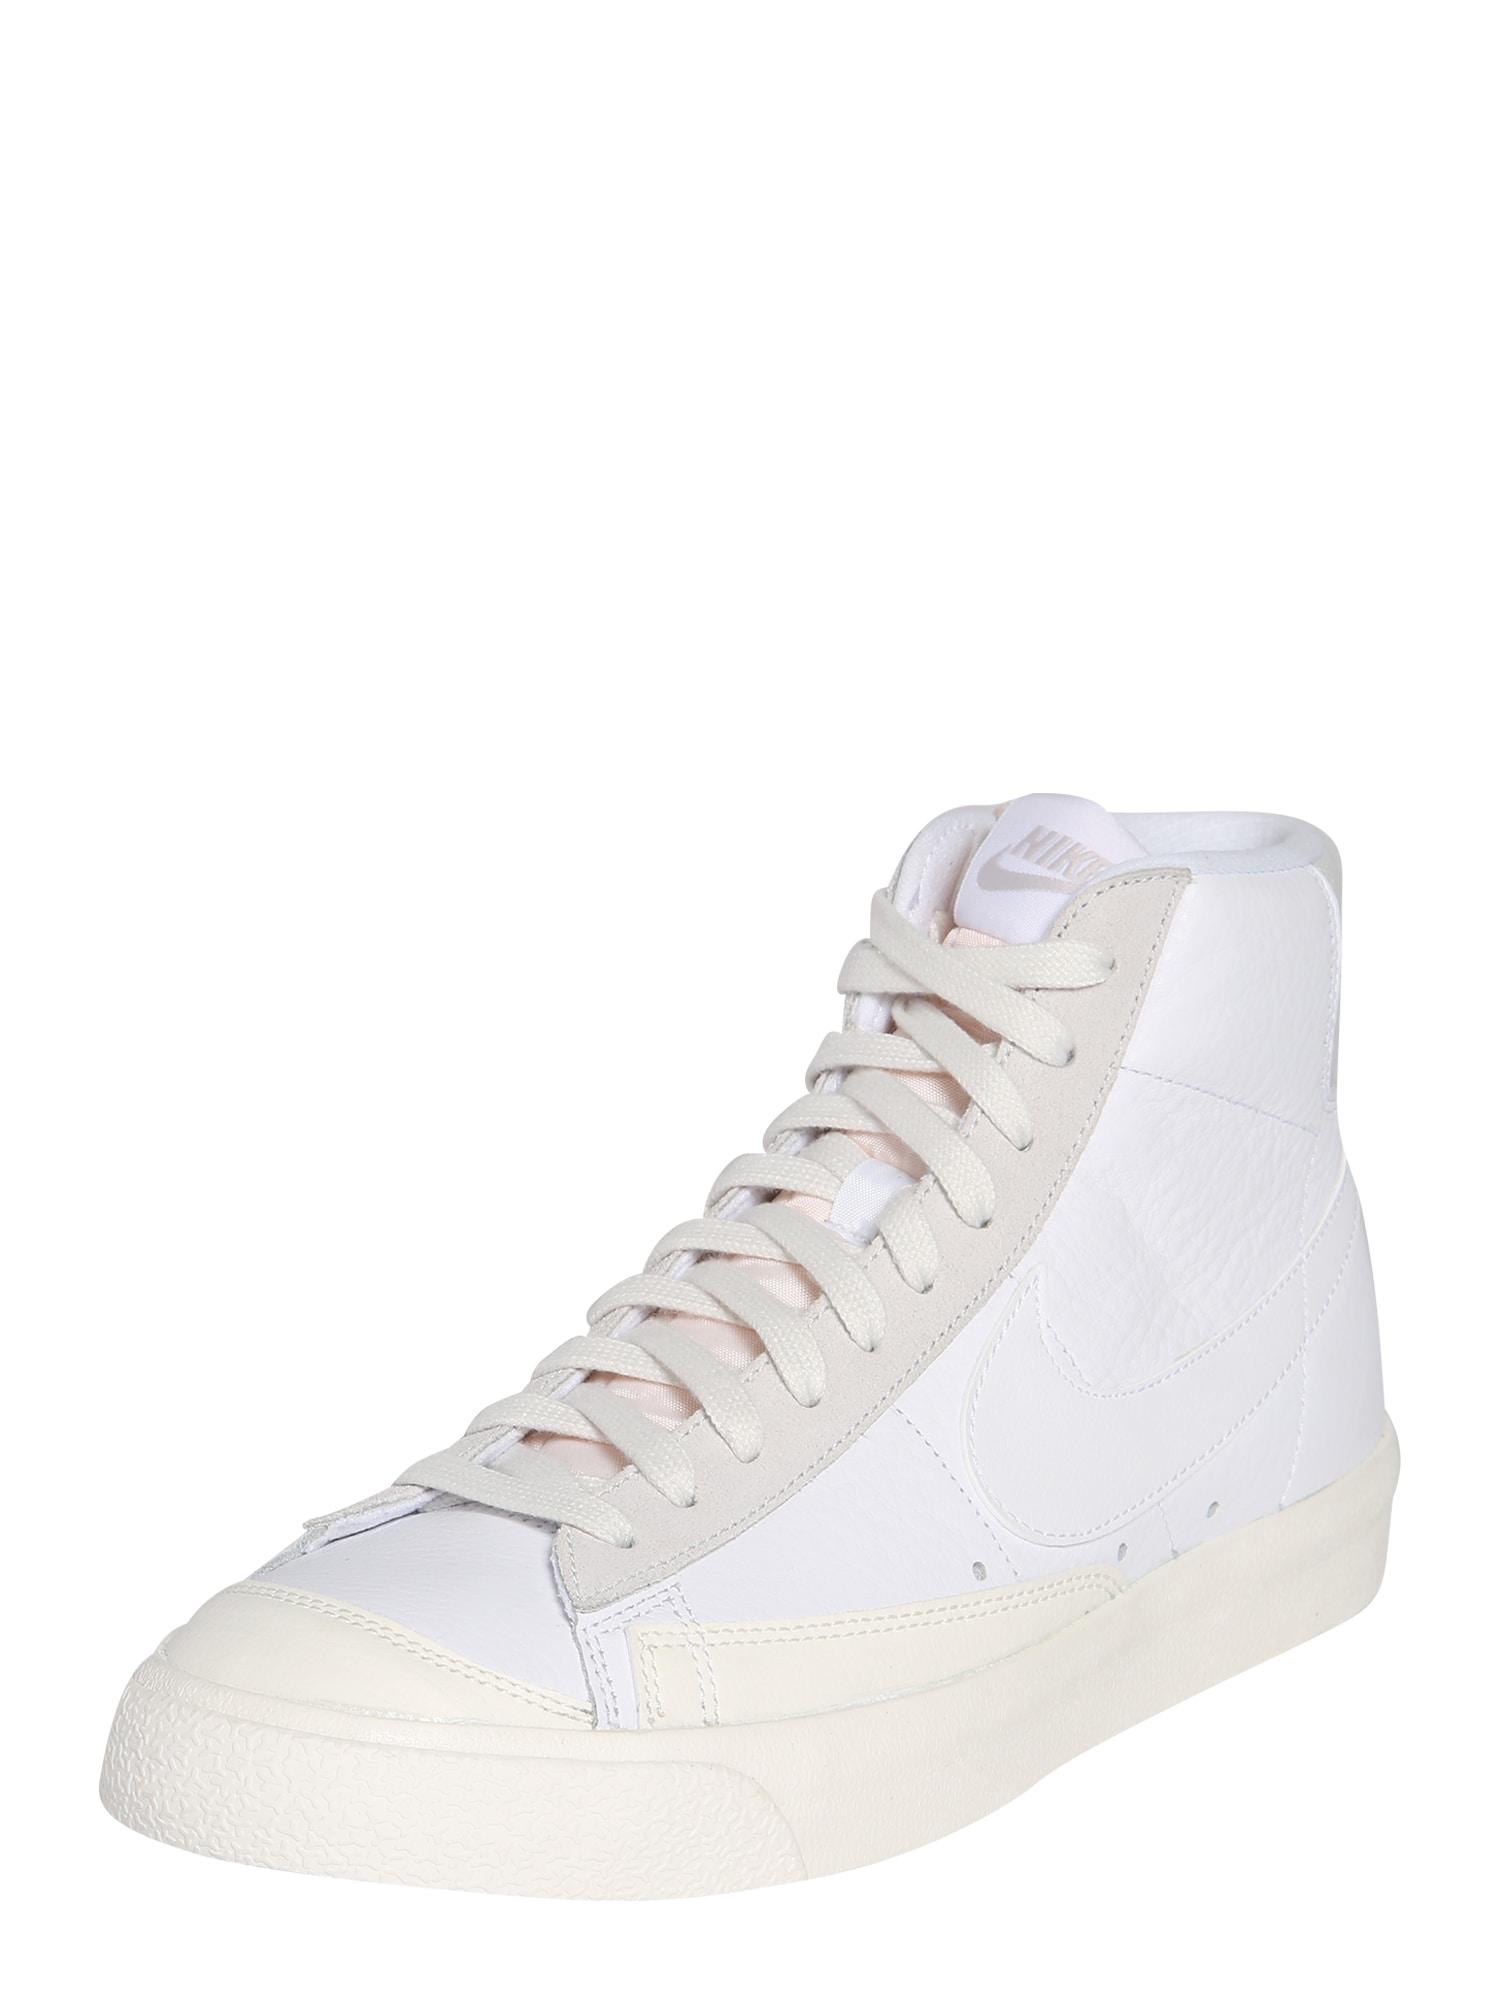 Nike Sportswear Členkové tenisky  biela